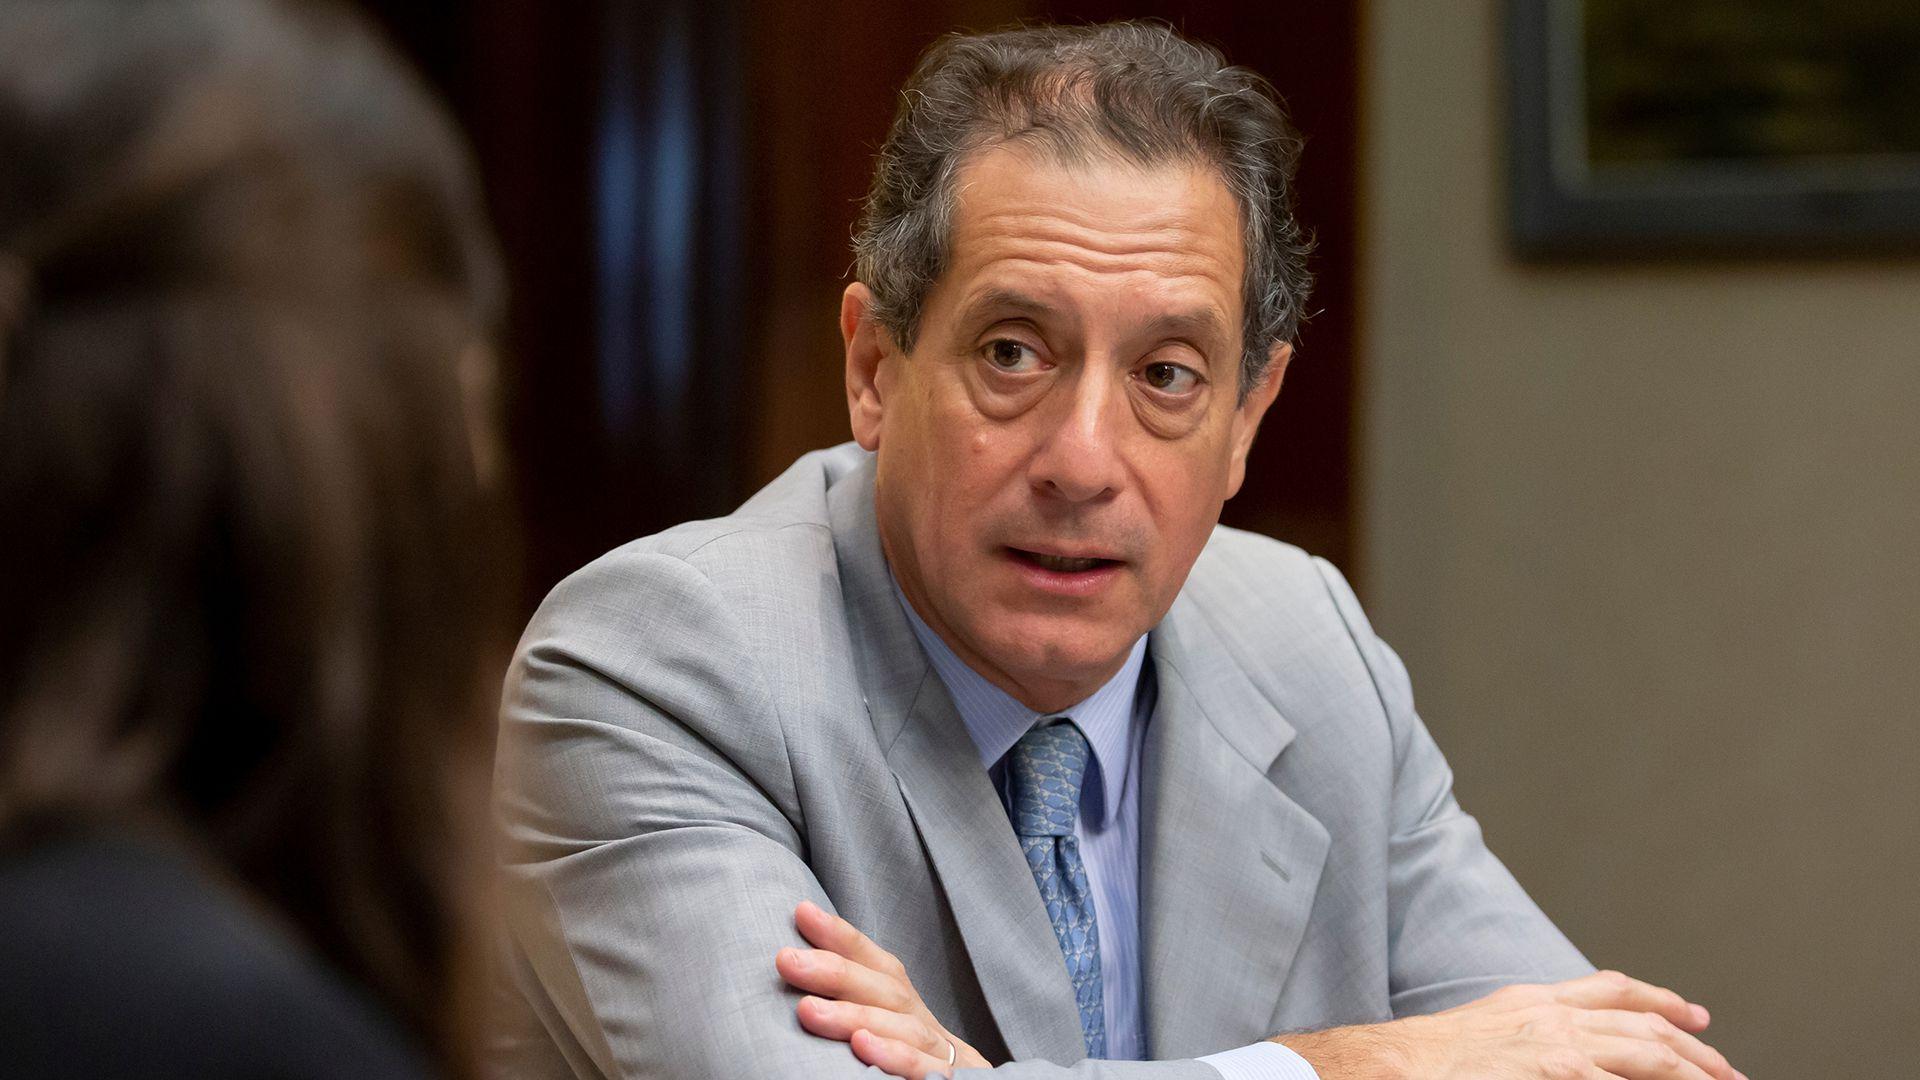 El titular del Banco Central, Miguel Pesce. (Maria Amasanti/Bloomberg)